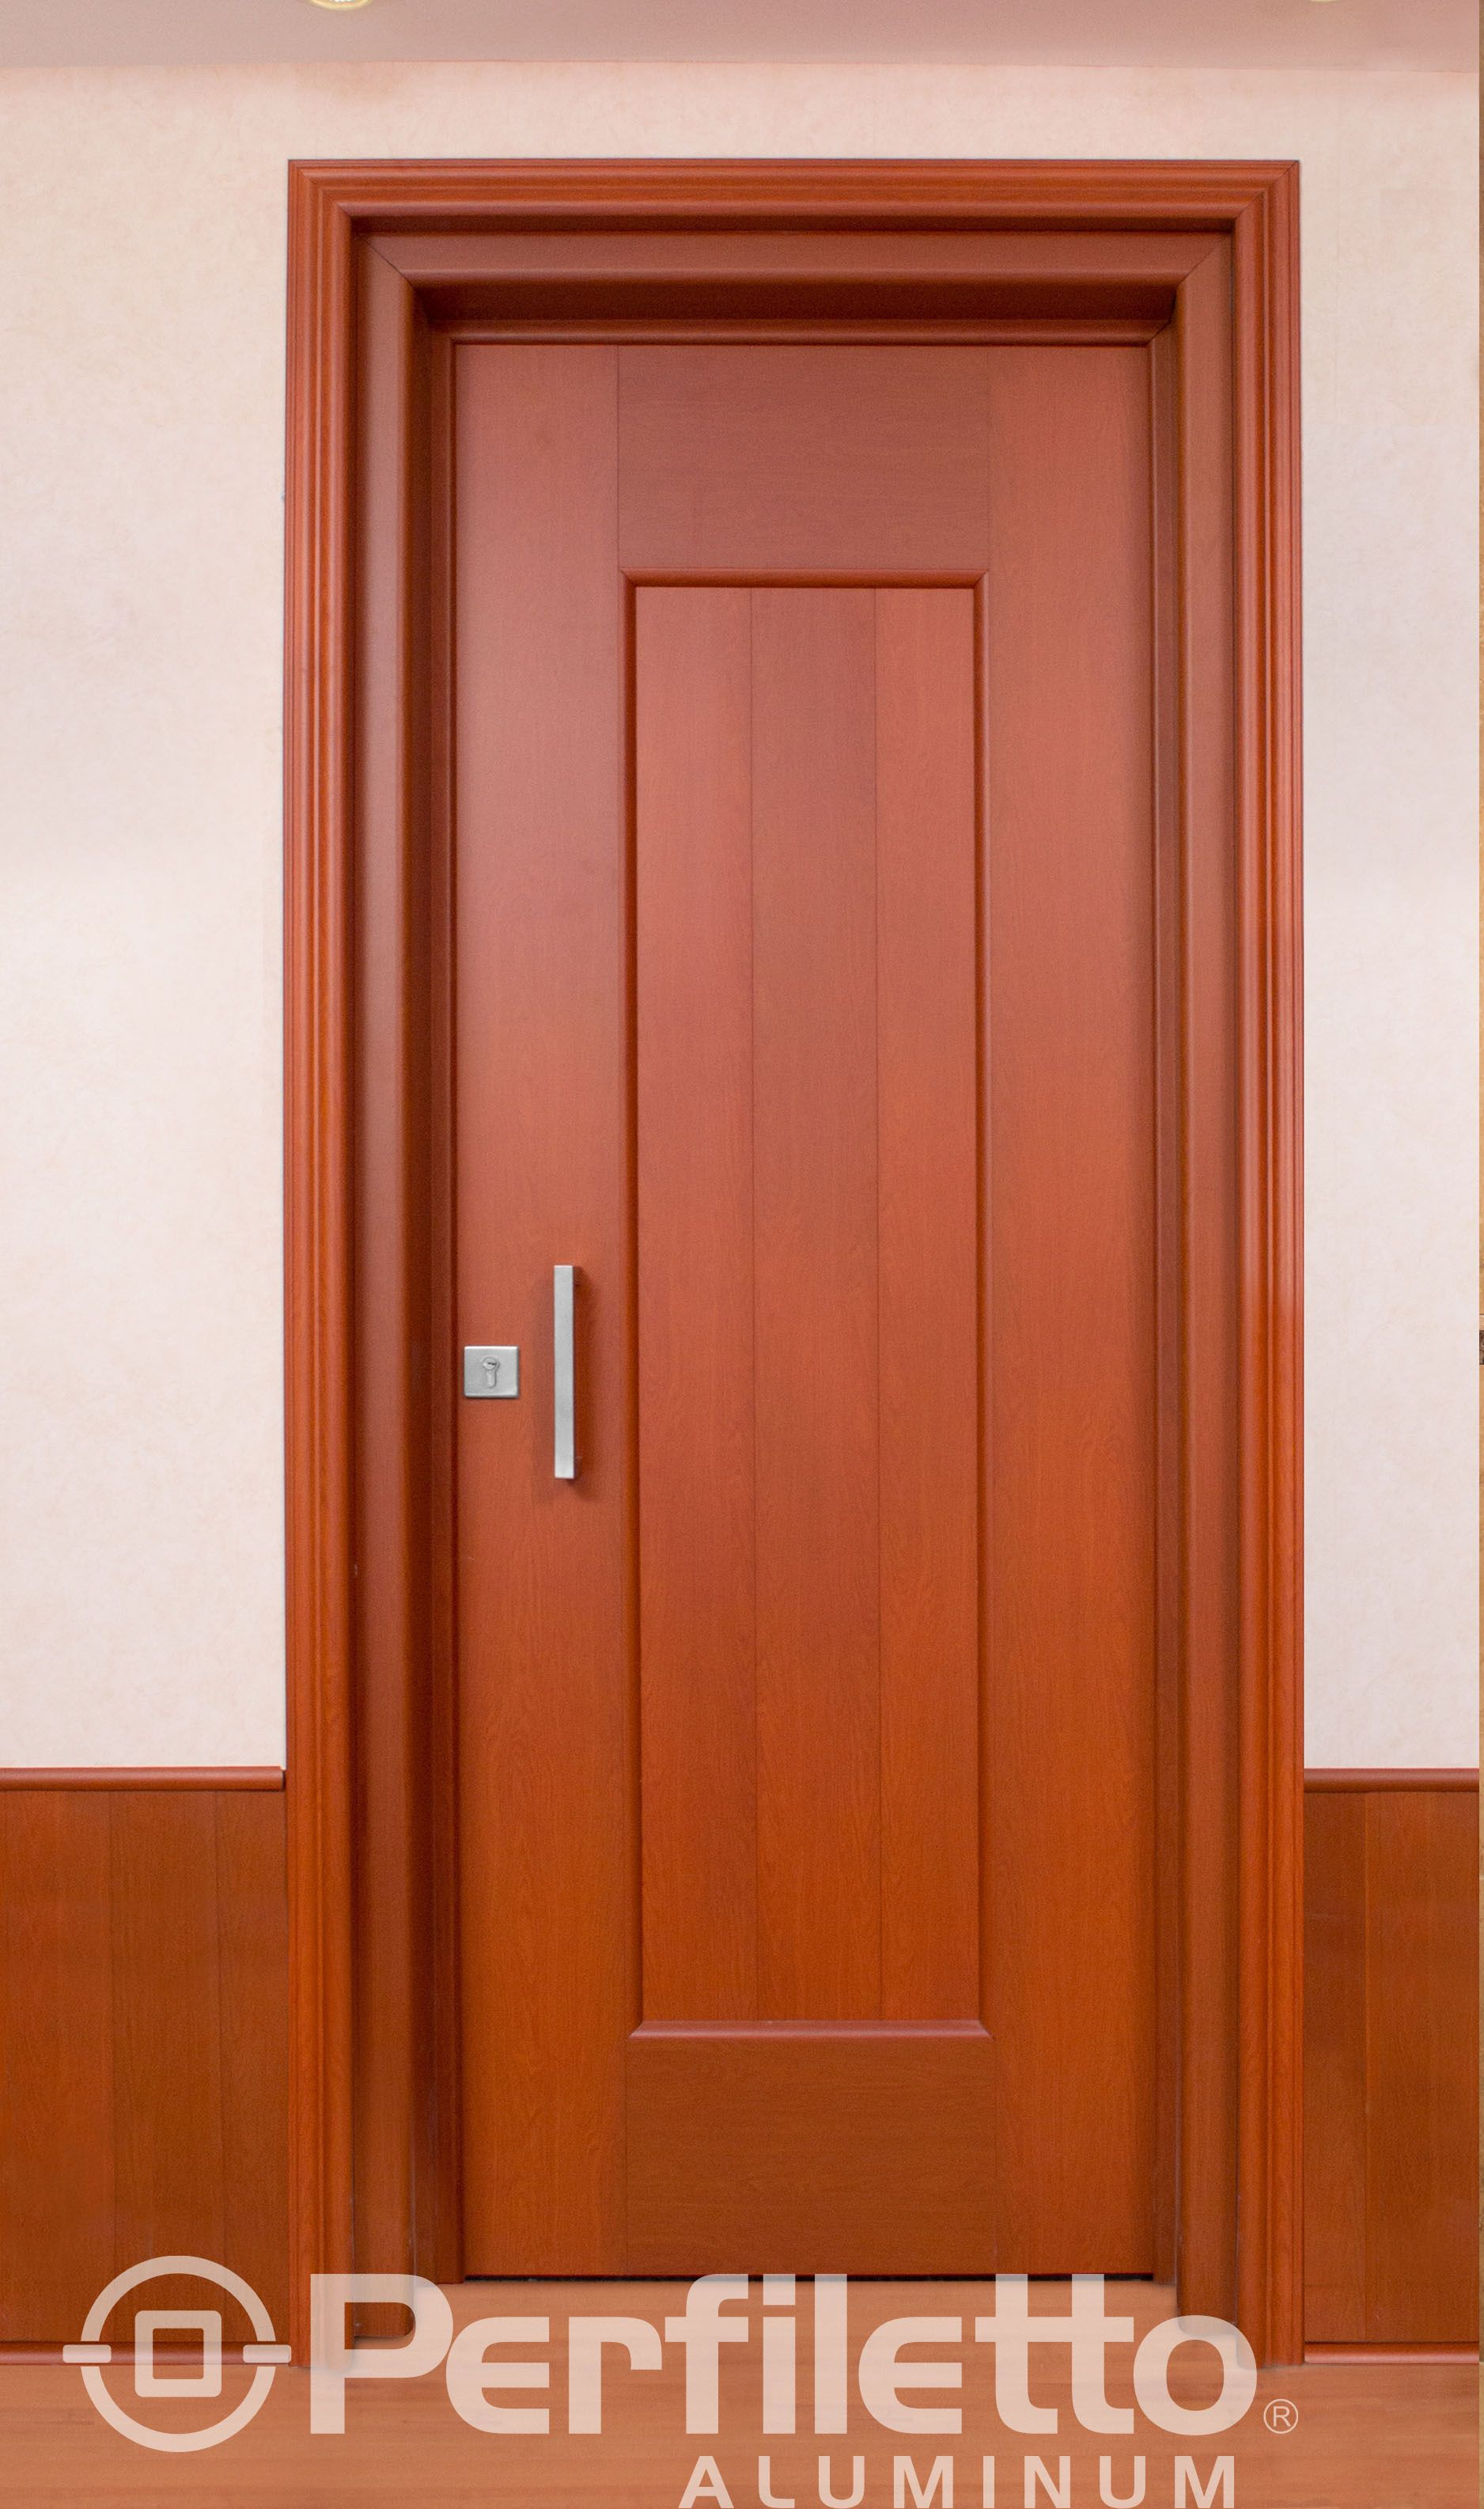 Puerta | Diseños Perfiletto | Pinterest | Puertas ventanas, Aluminio ...